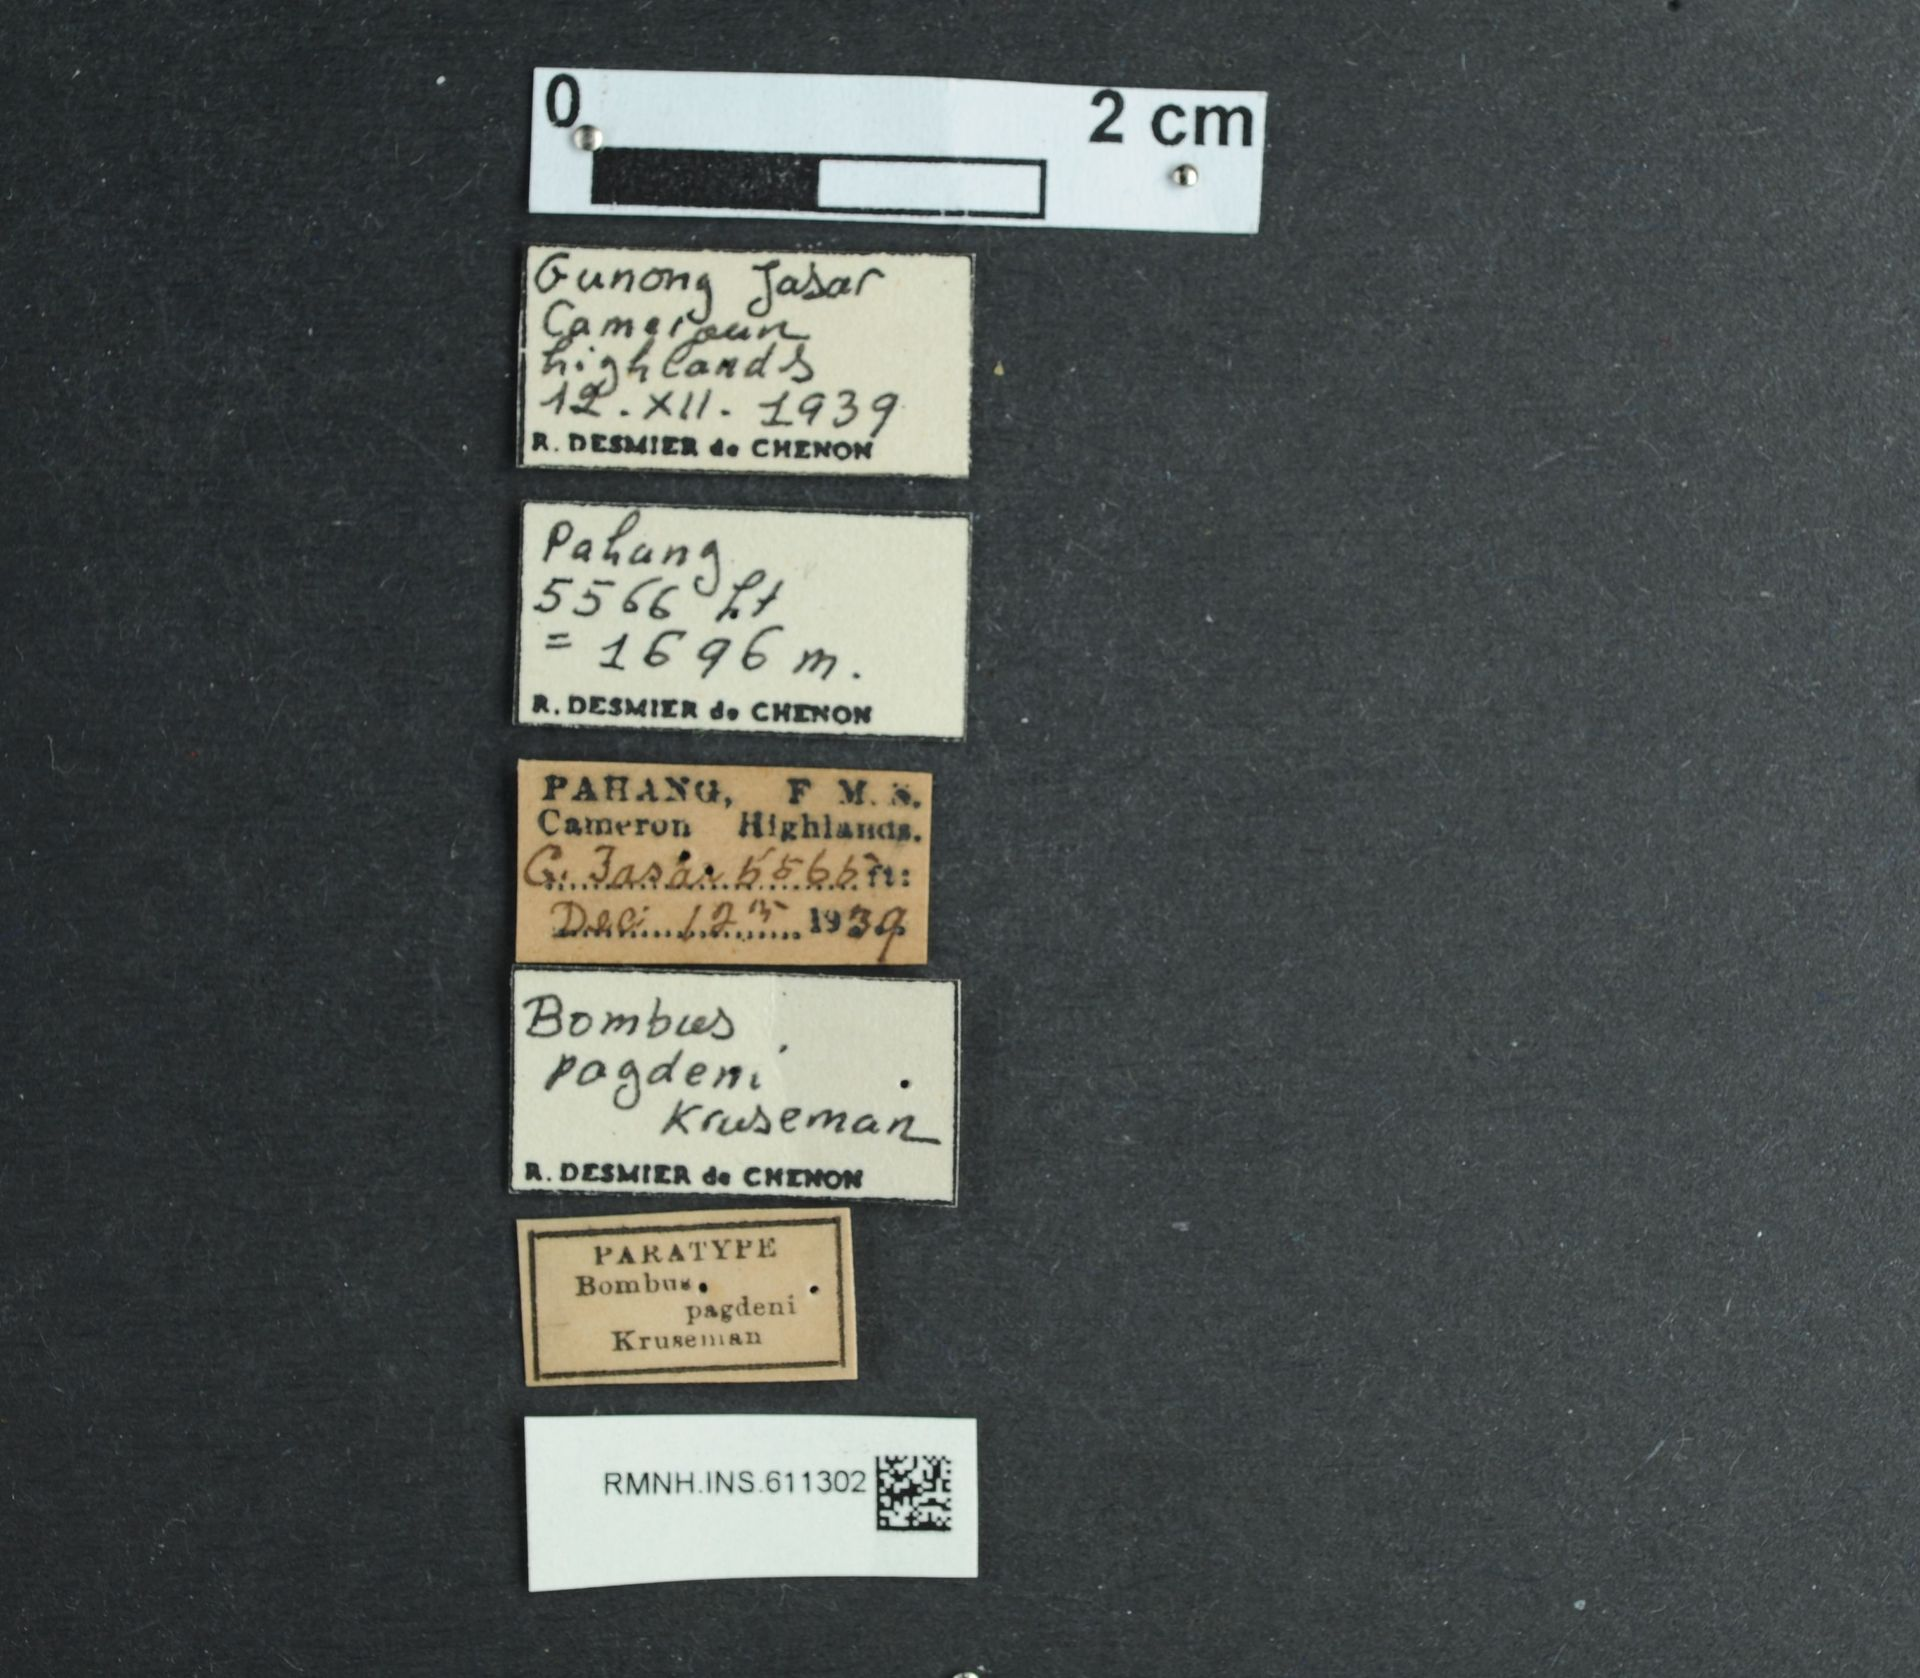 RMNH.INS.611302 | Bombus pagdeni Kruseman